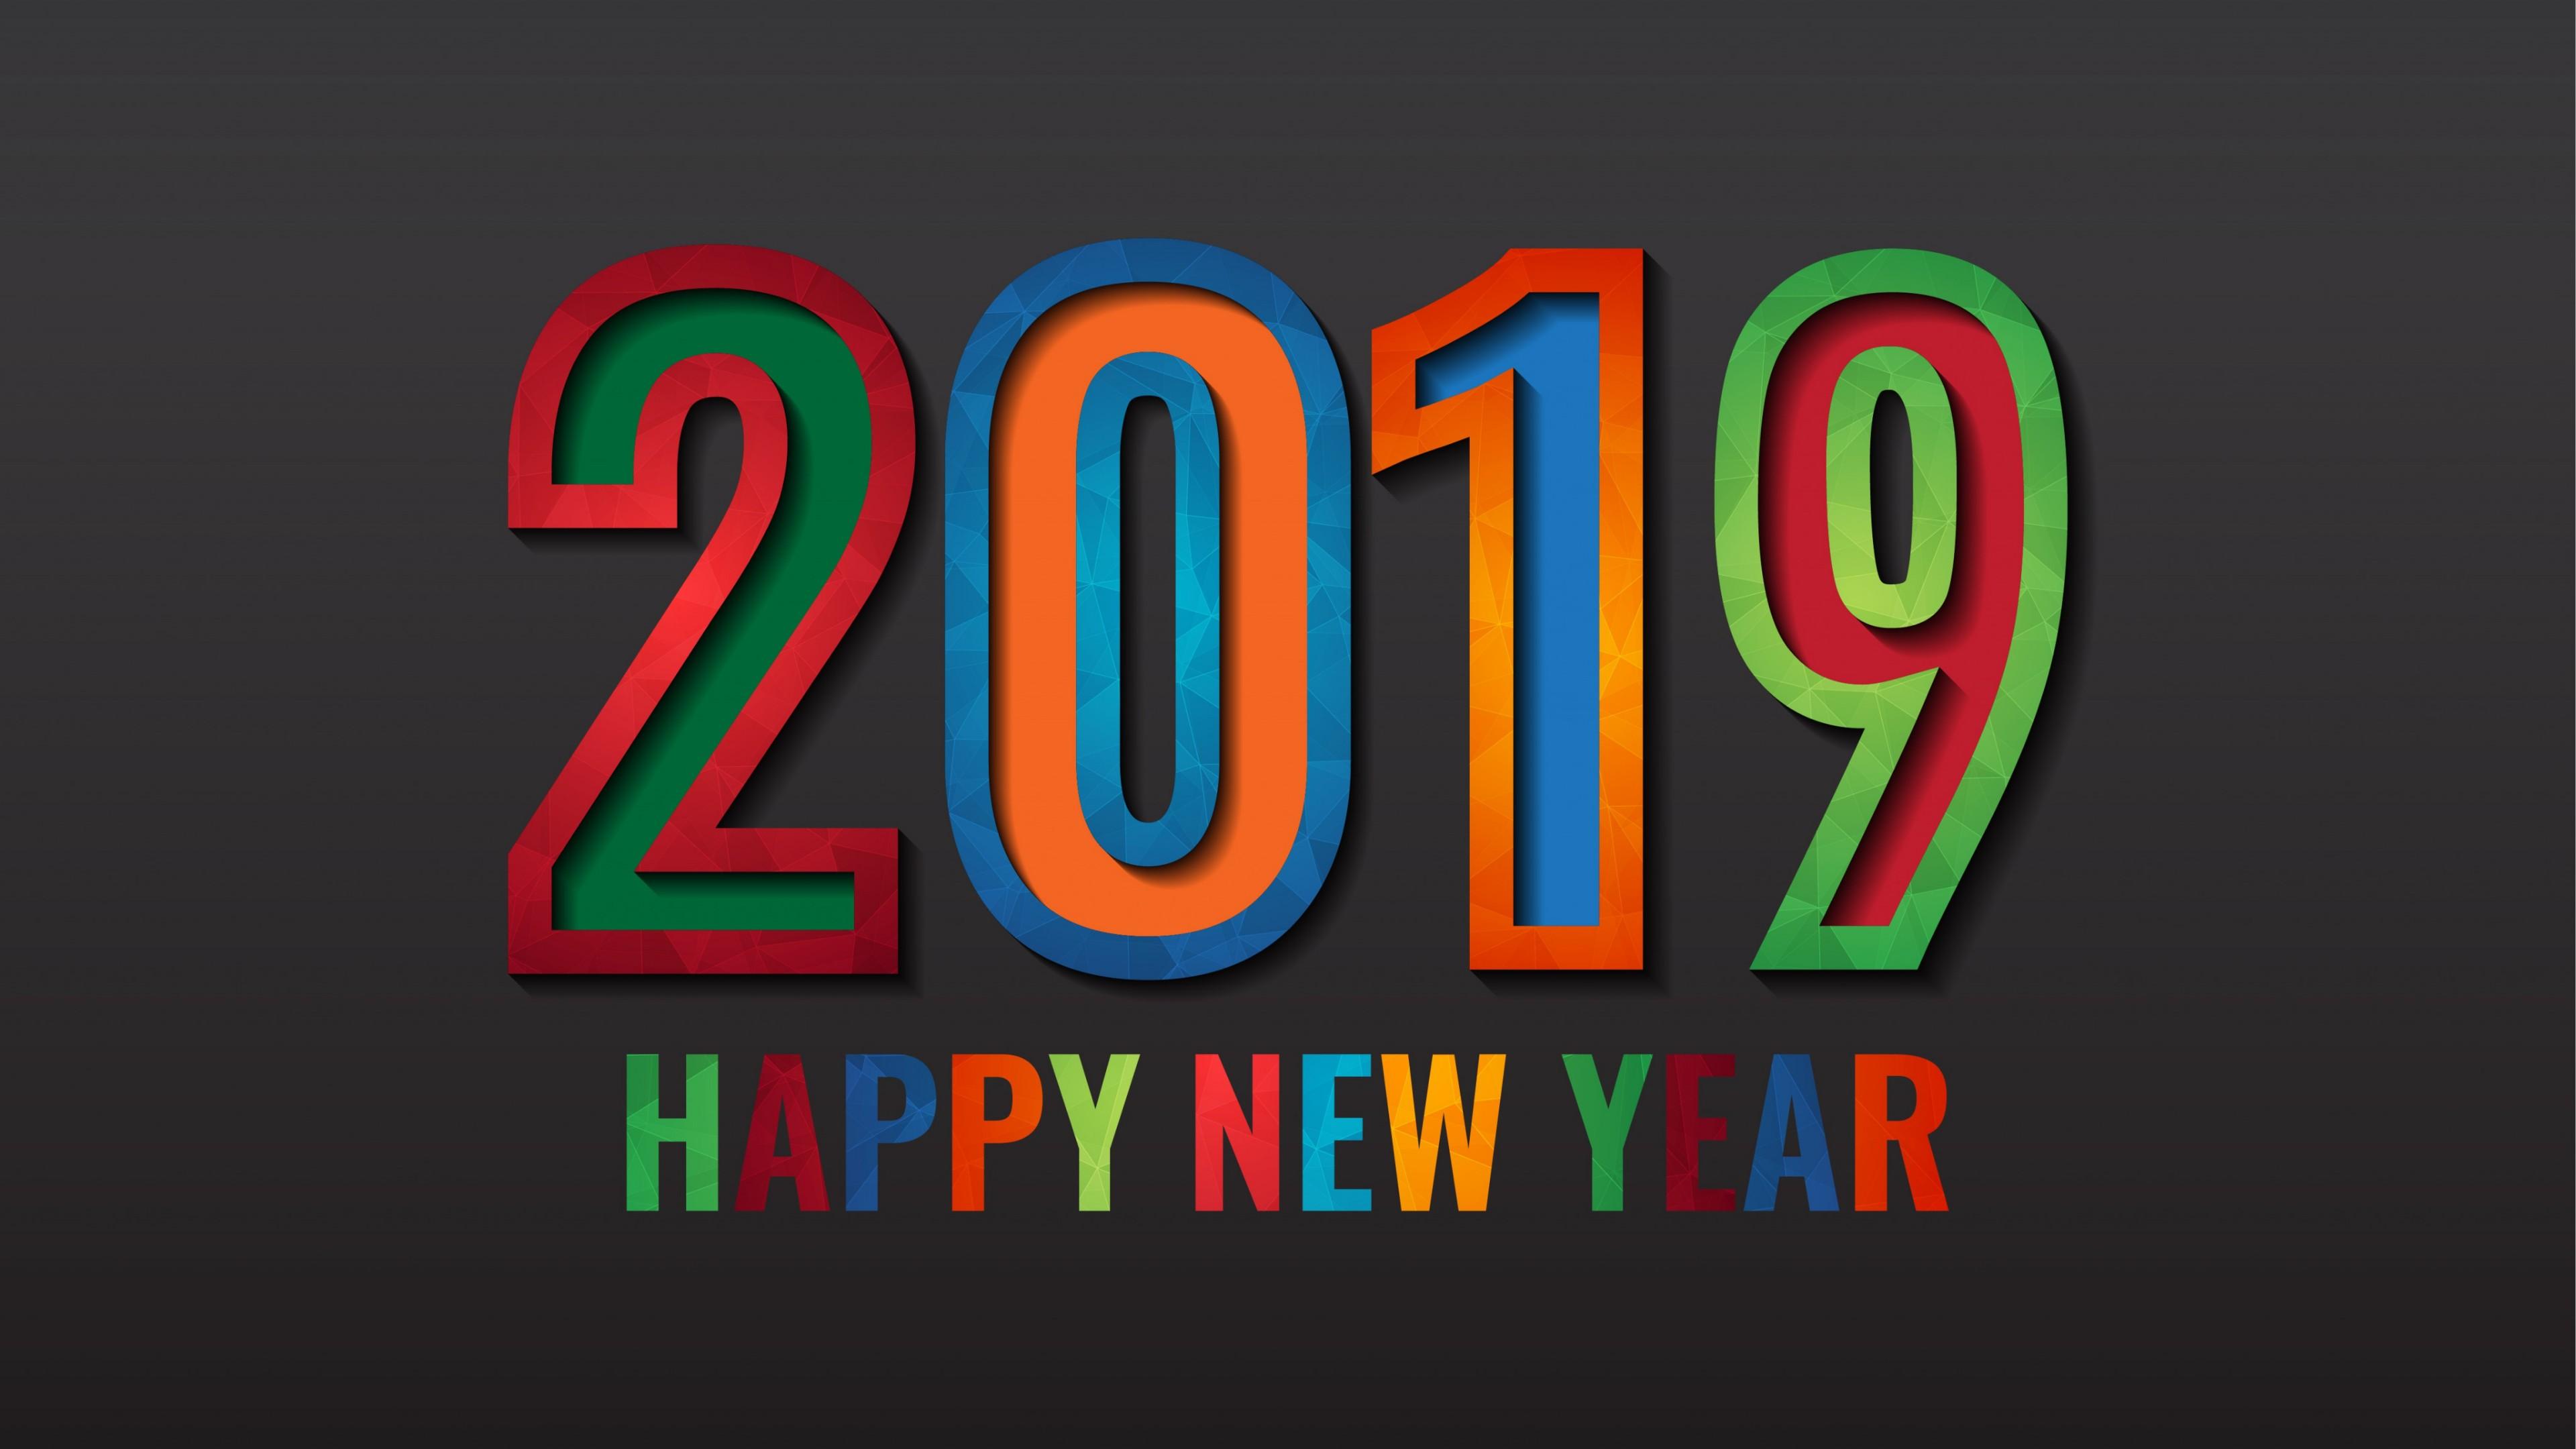 2019 Happy New Year! wallpaper